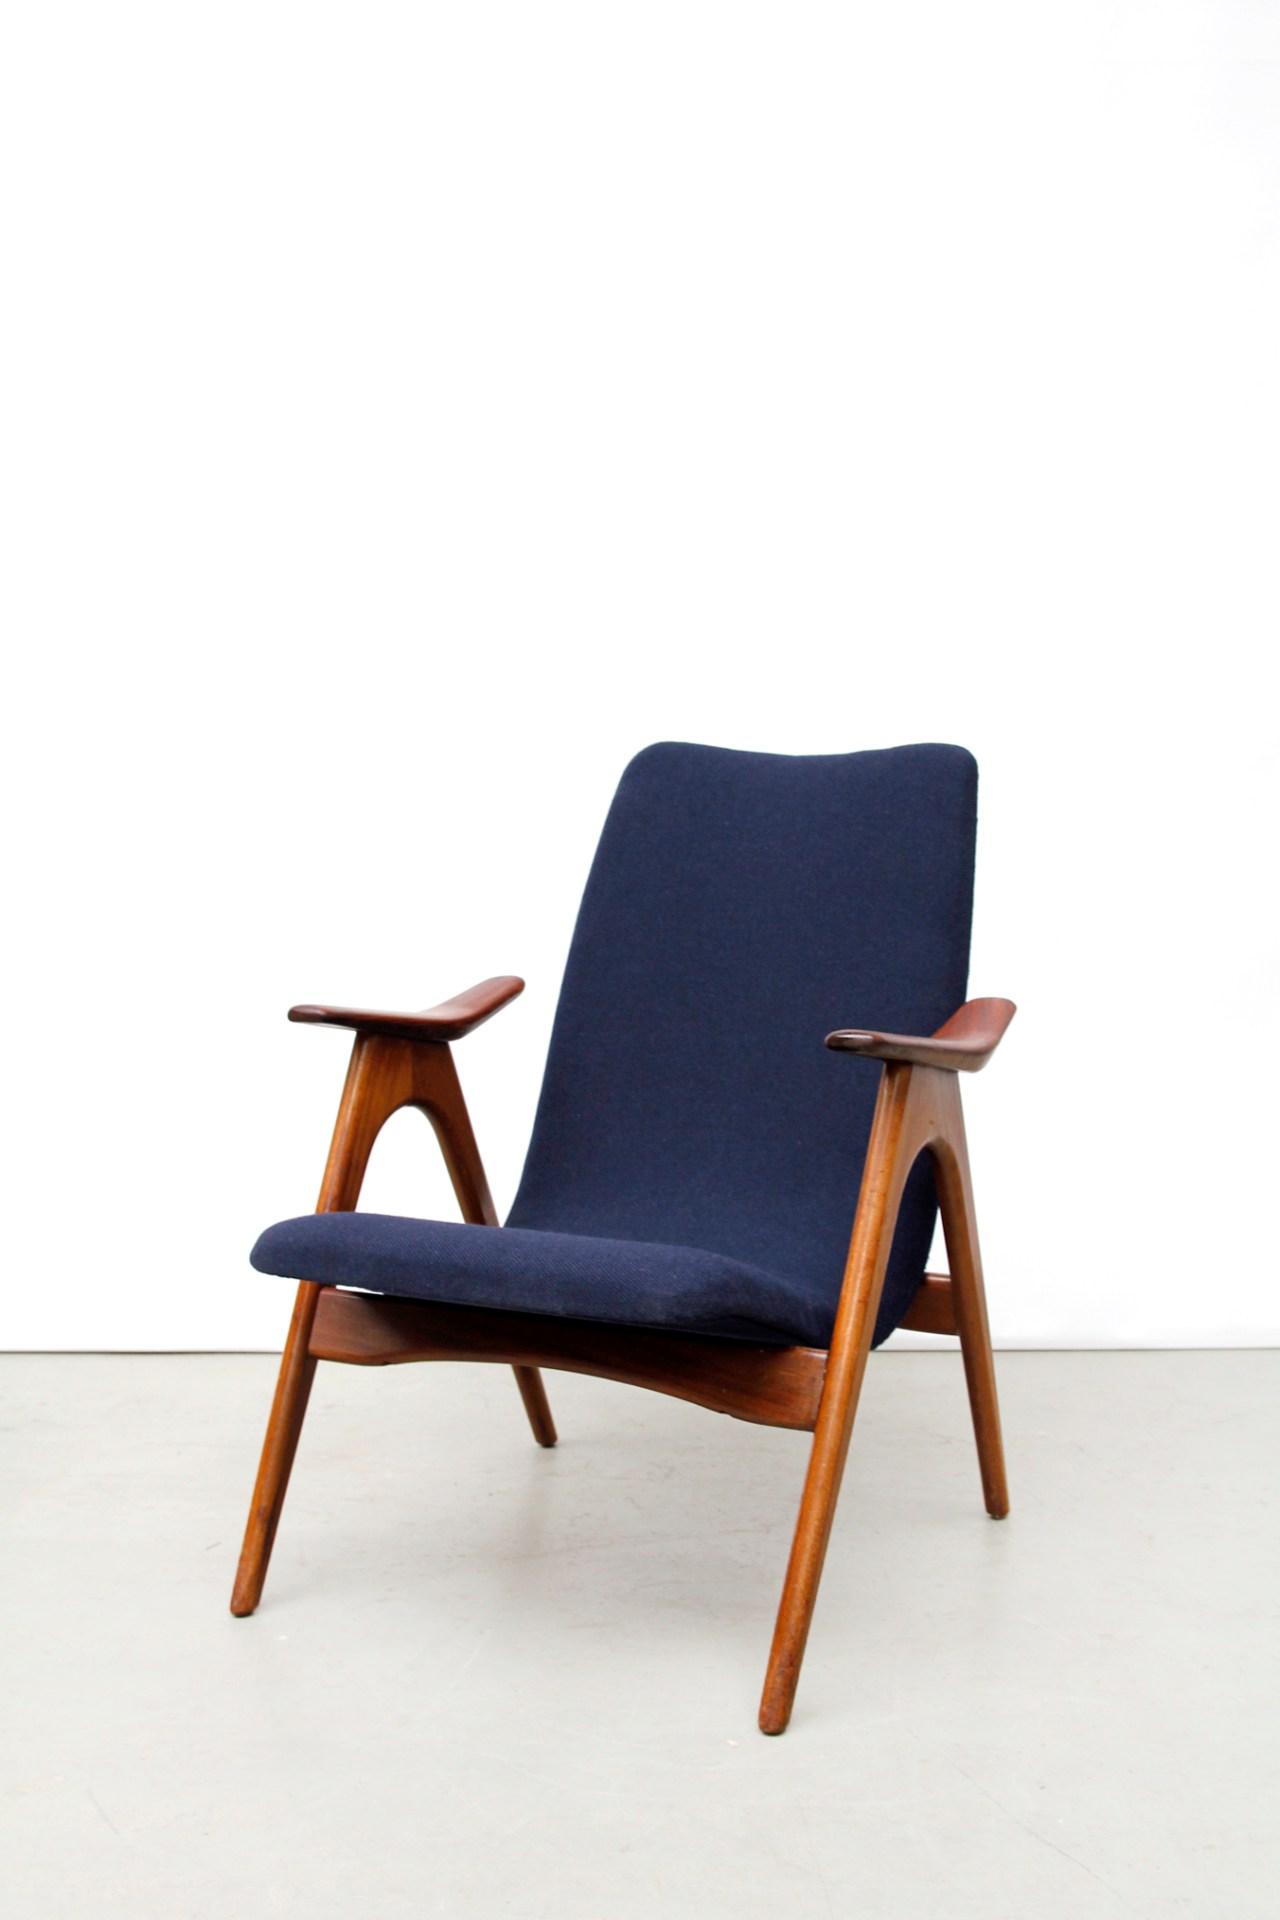 Blauwe Vintage Design Fauteuil Van Ons